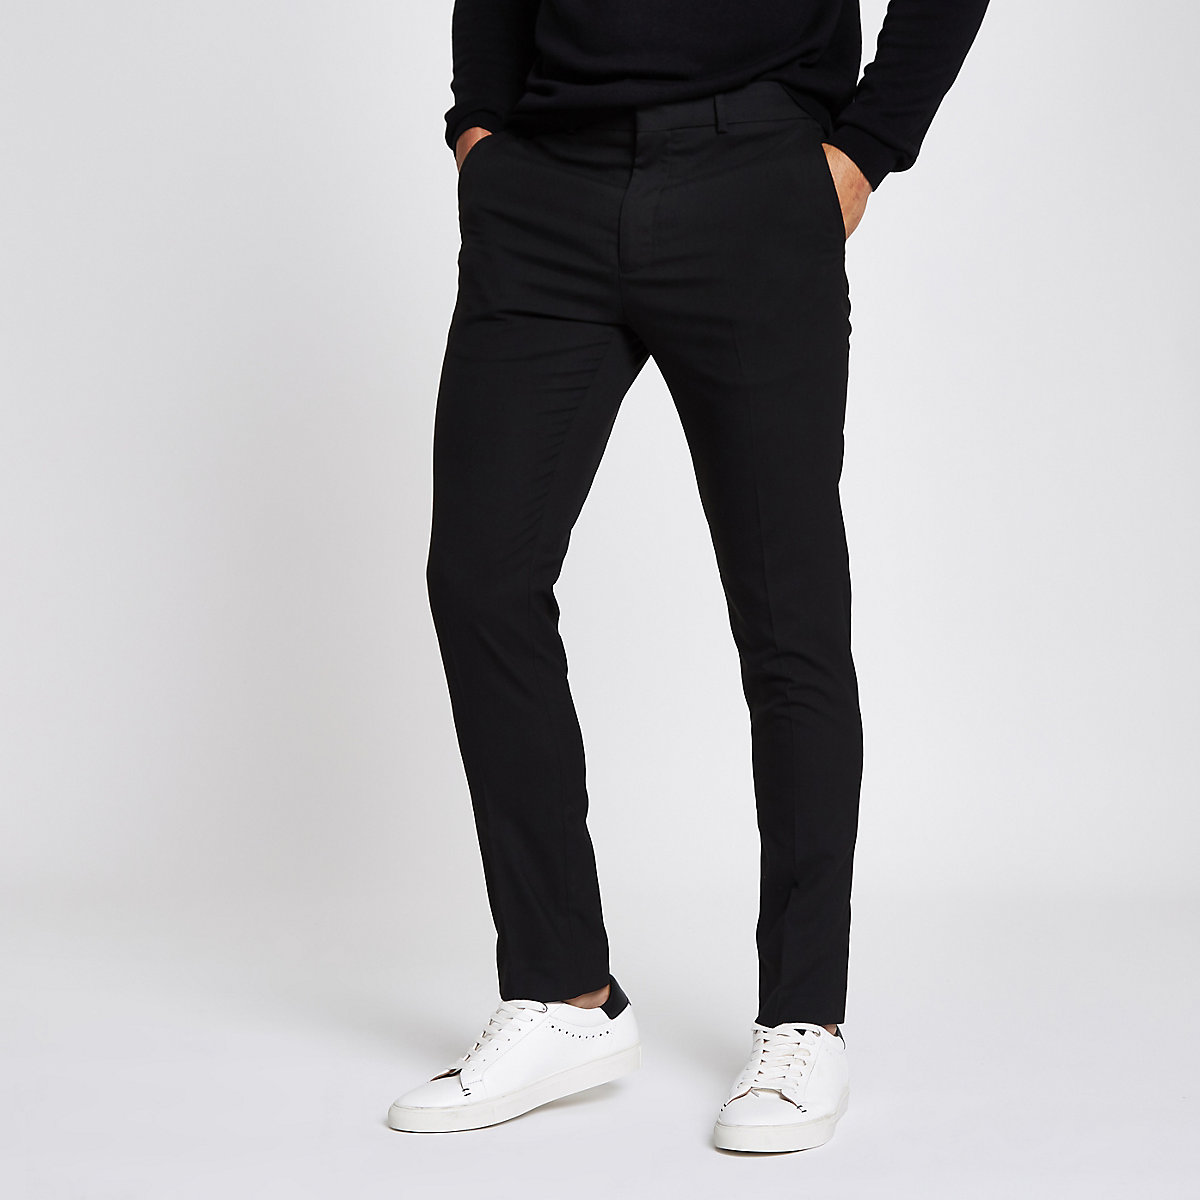 Black skinny fit smart pants